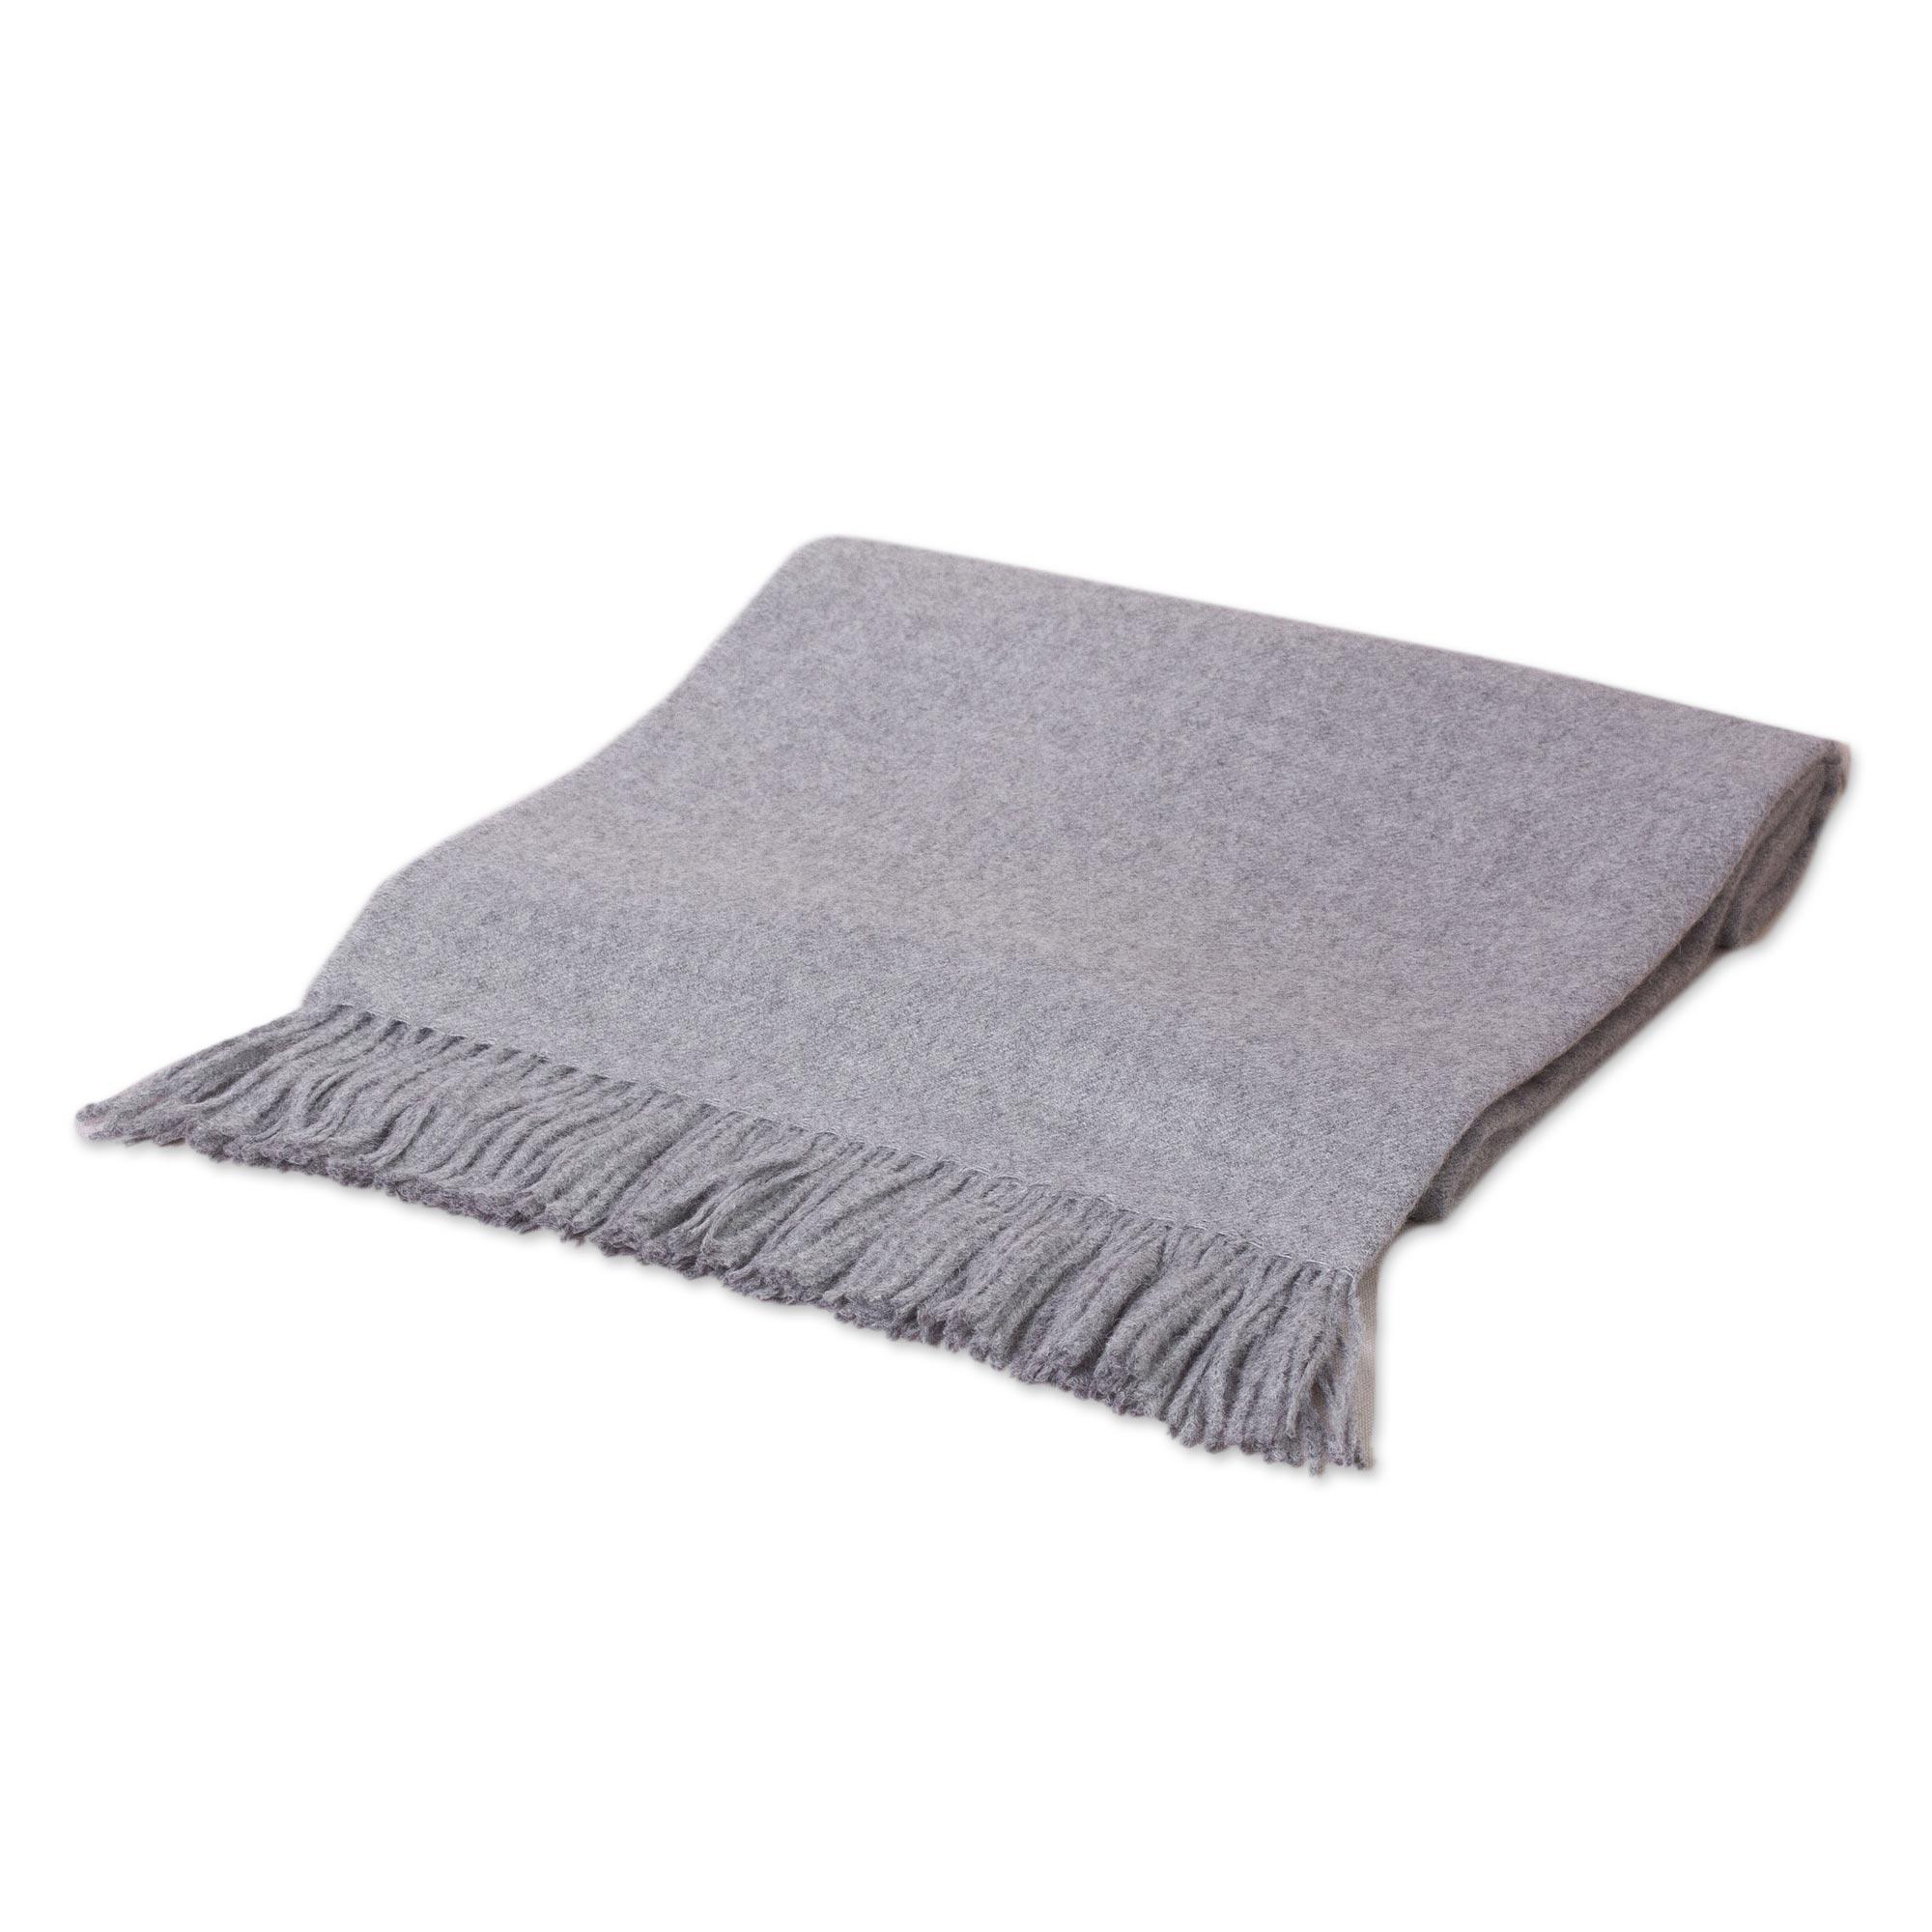 alpaca wool solid grey throw blanket  cozy light gray  novica -